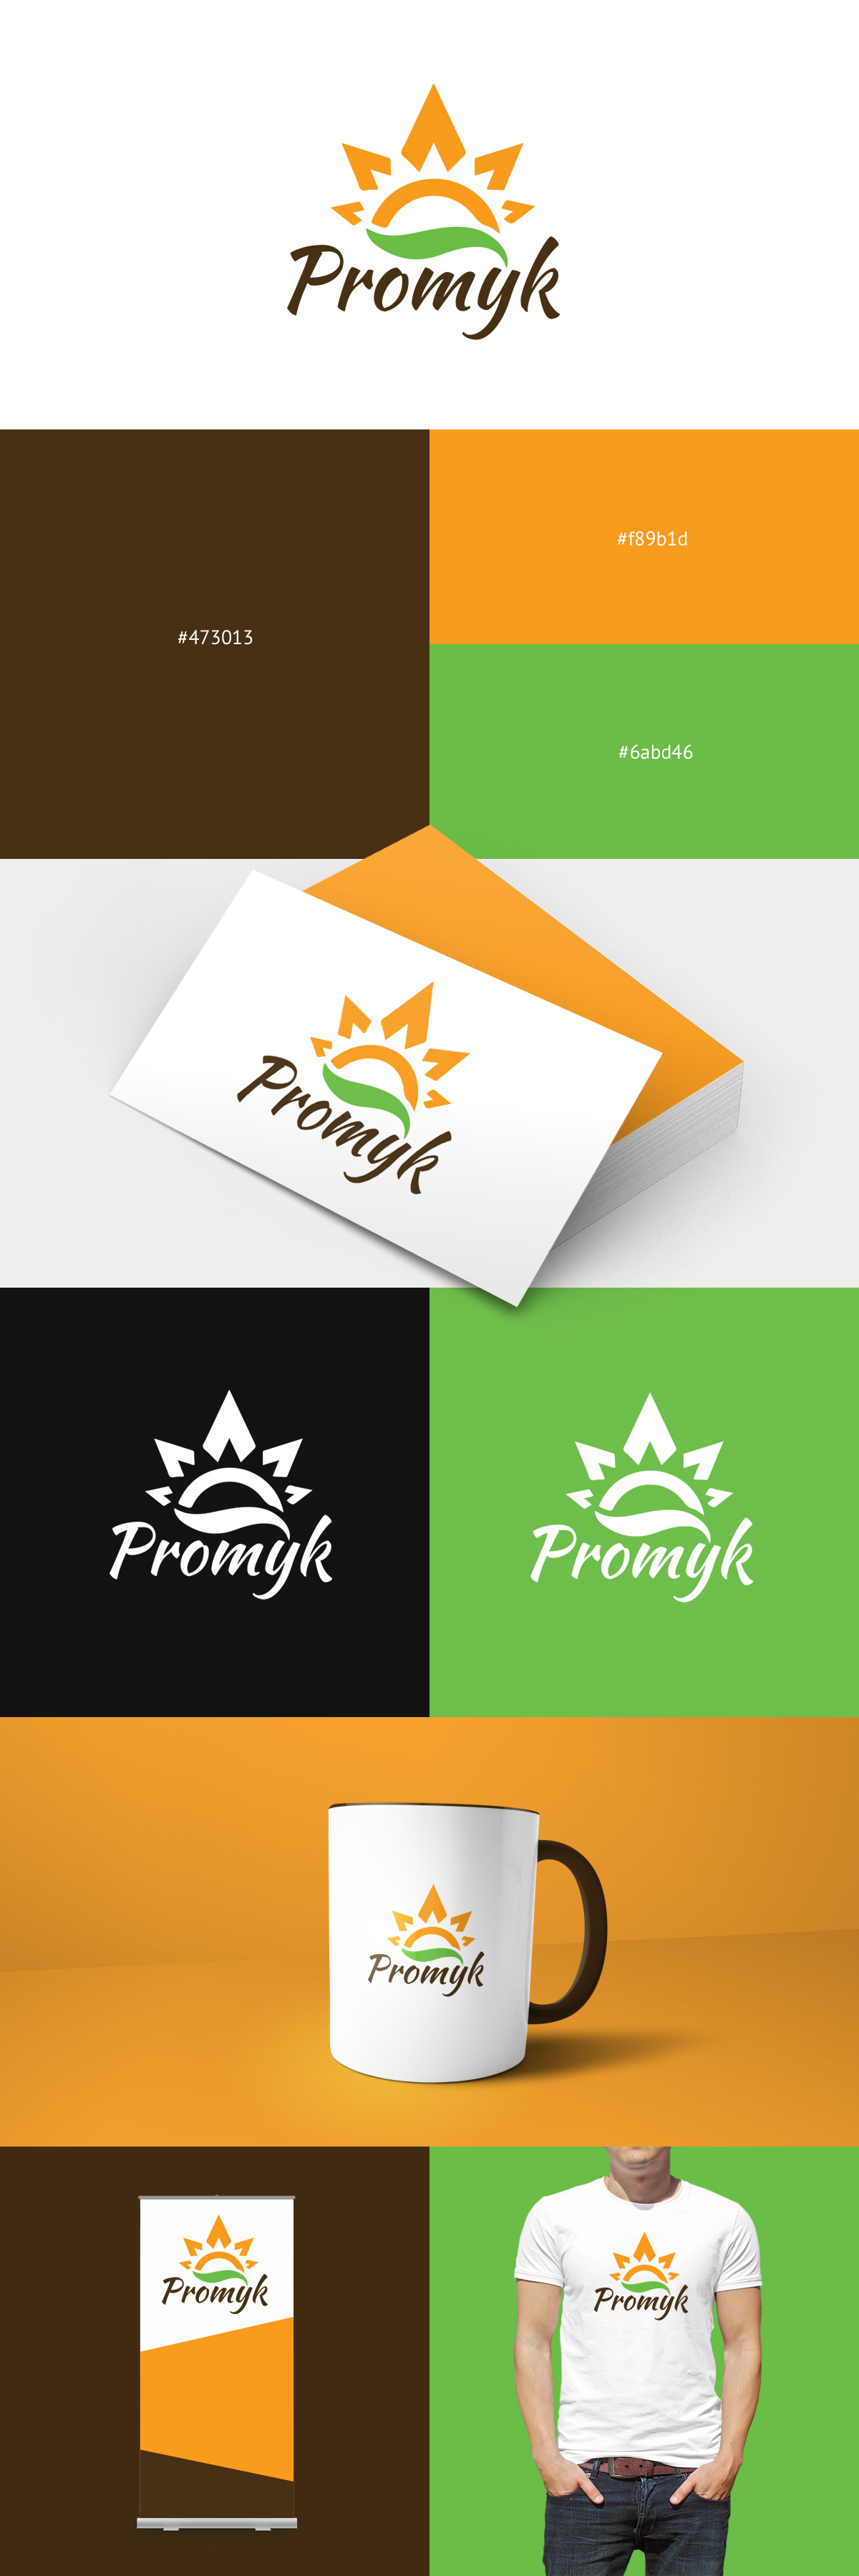 projekt-logo-promyk-rzut